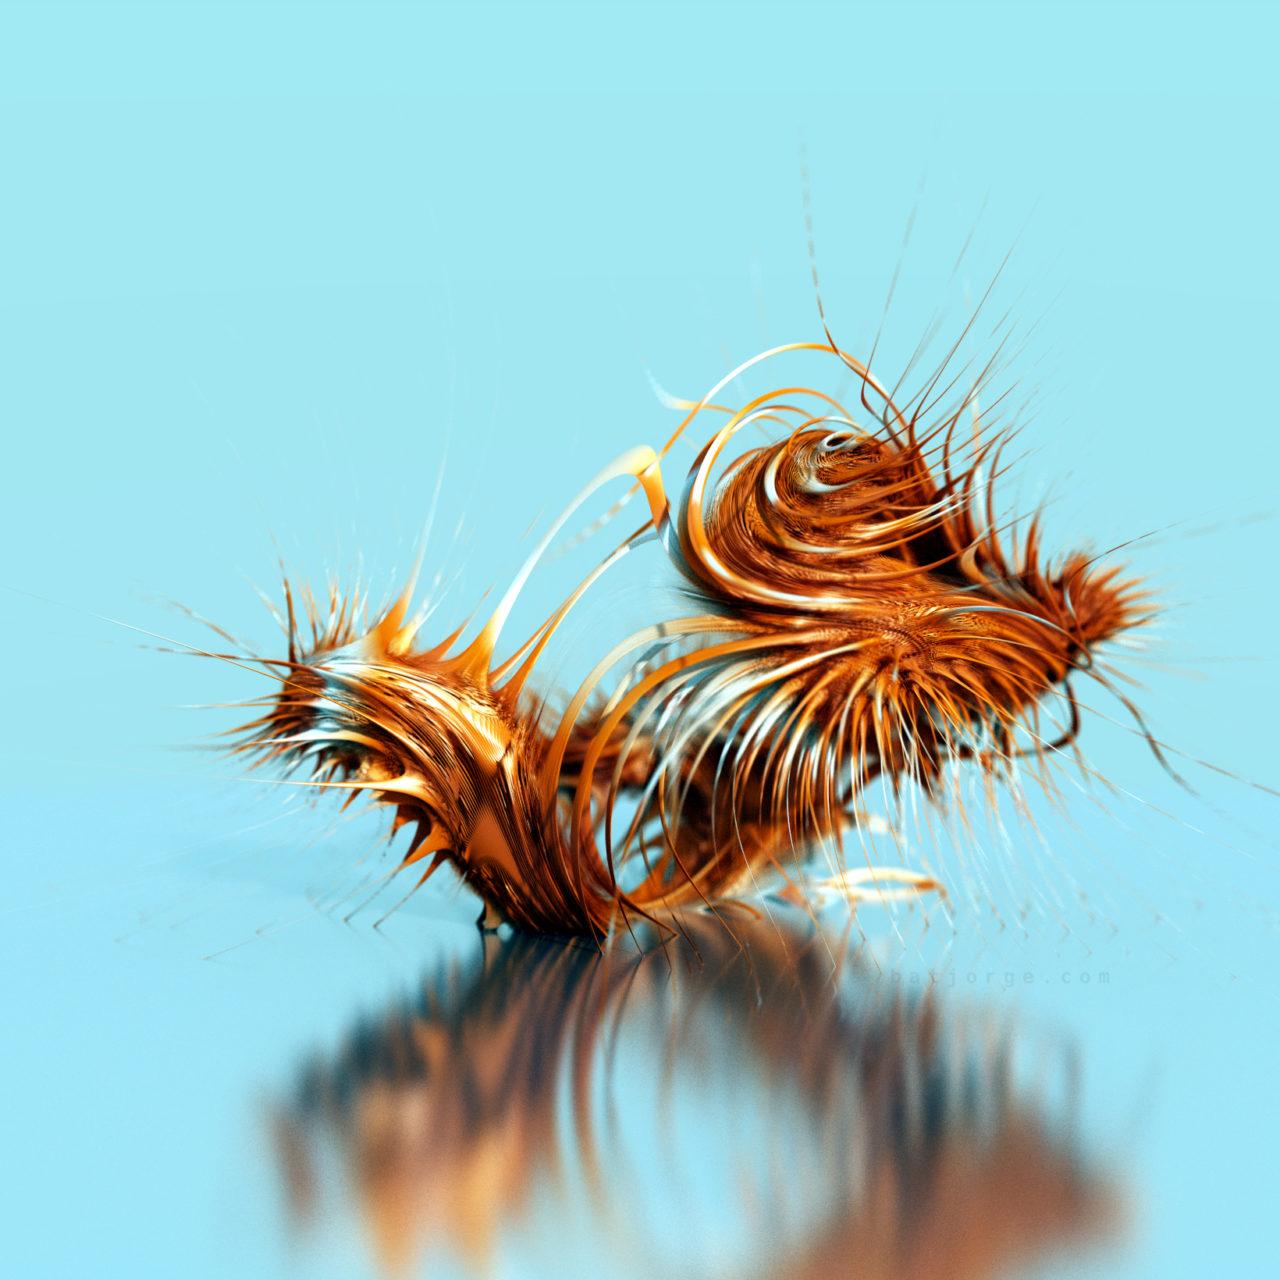 3D fractal. mandelbulber abstract spikes